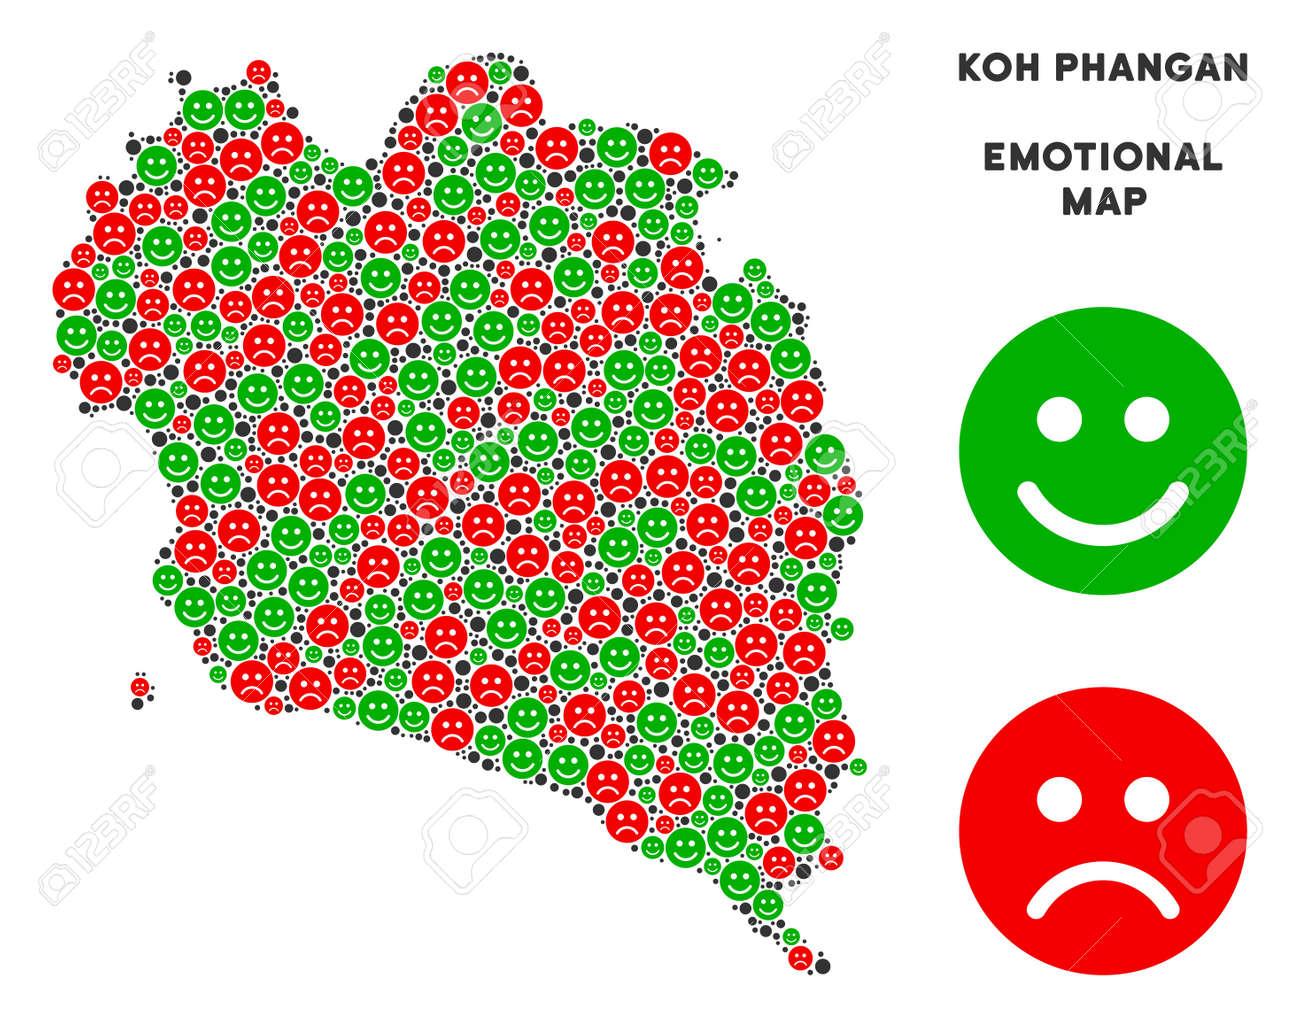 Koh Phangan Thailand Map.Happiness And Sorrow Koh Phangan Thai Island Map Composition